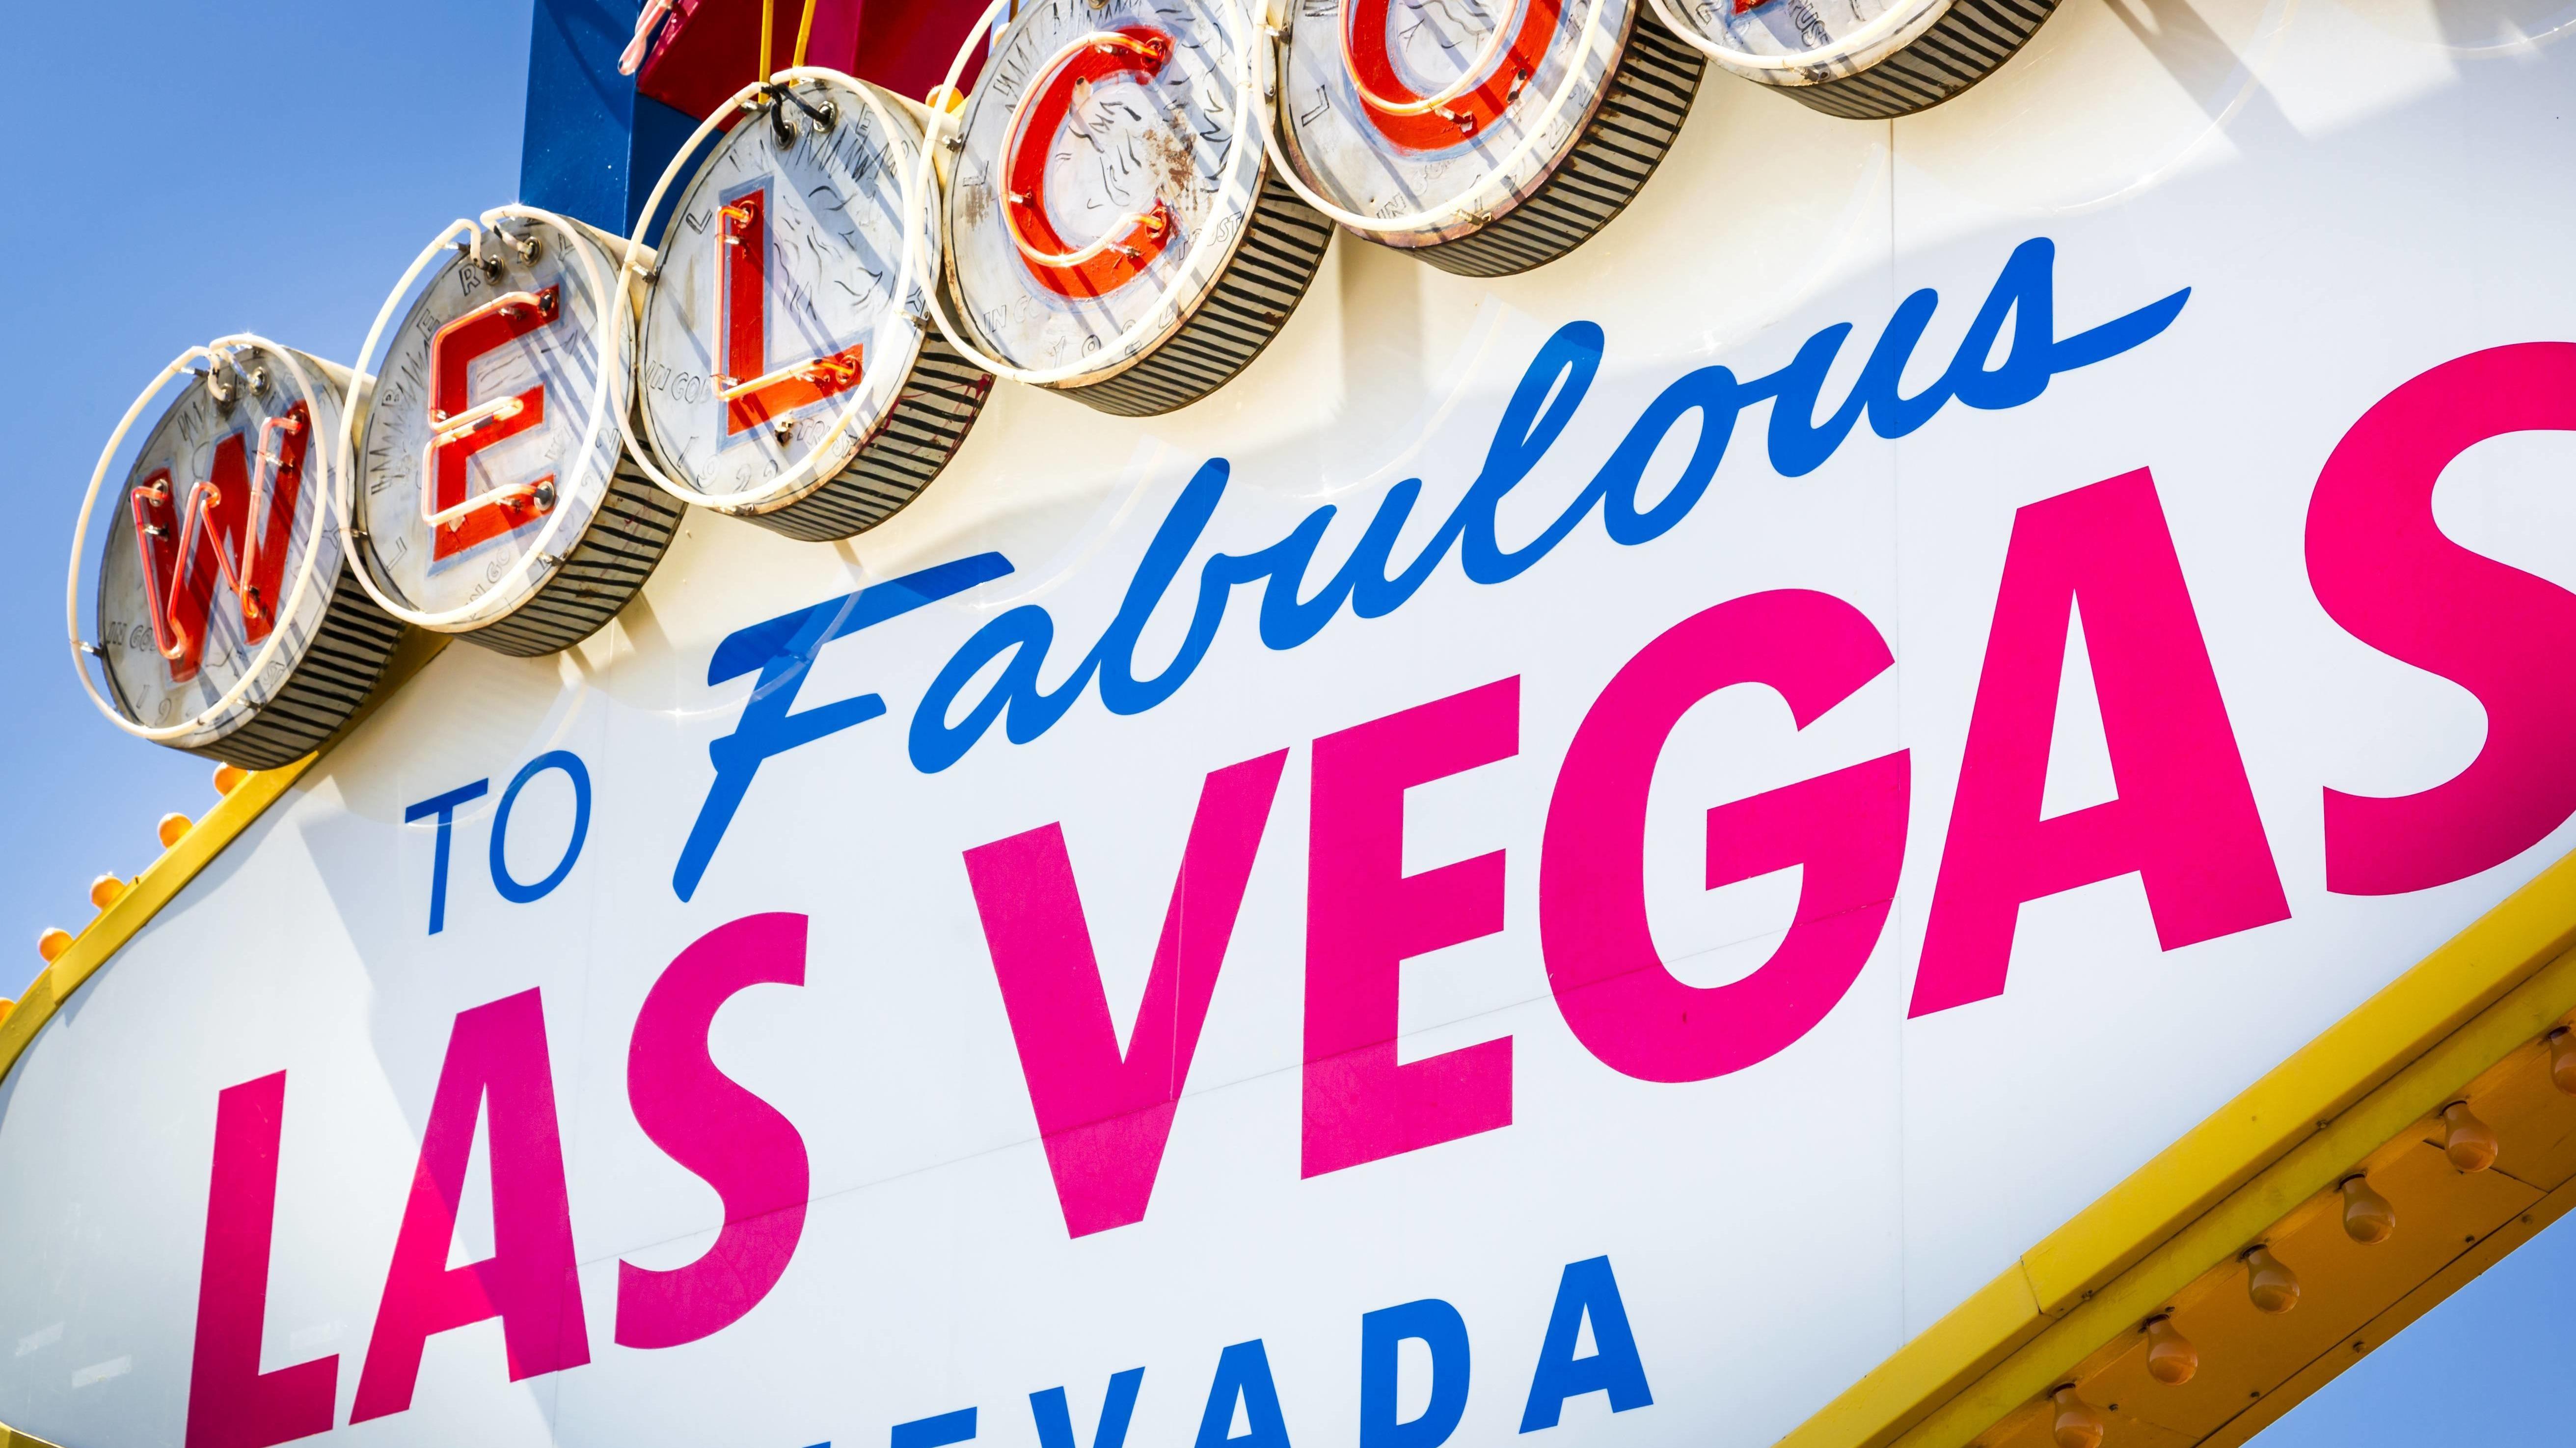 Neonreklame in Las Vegas